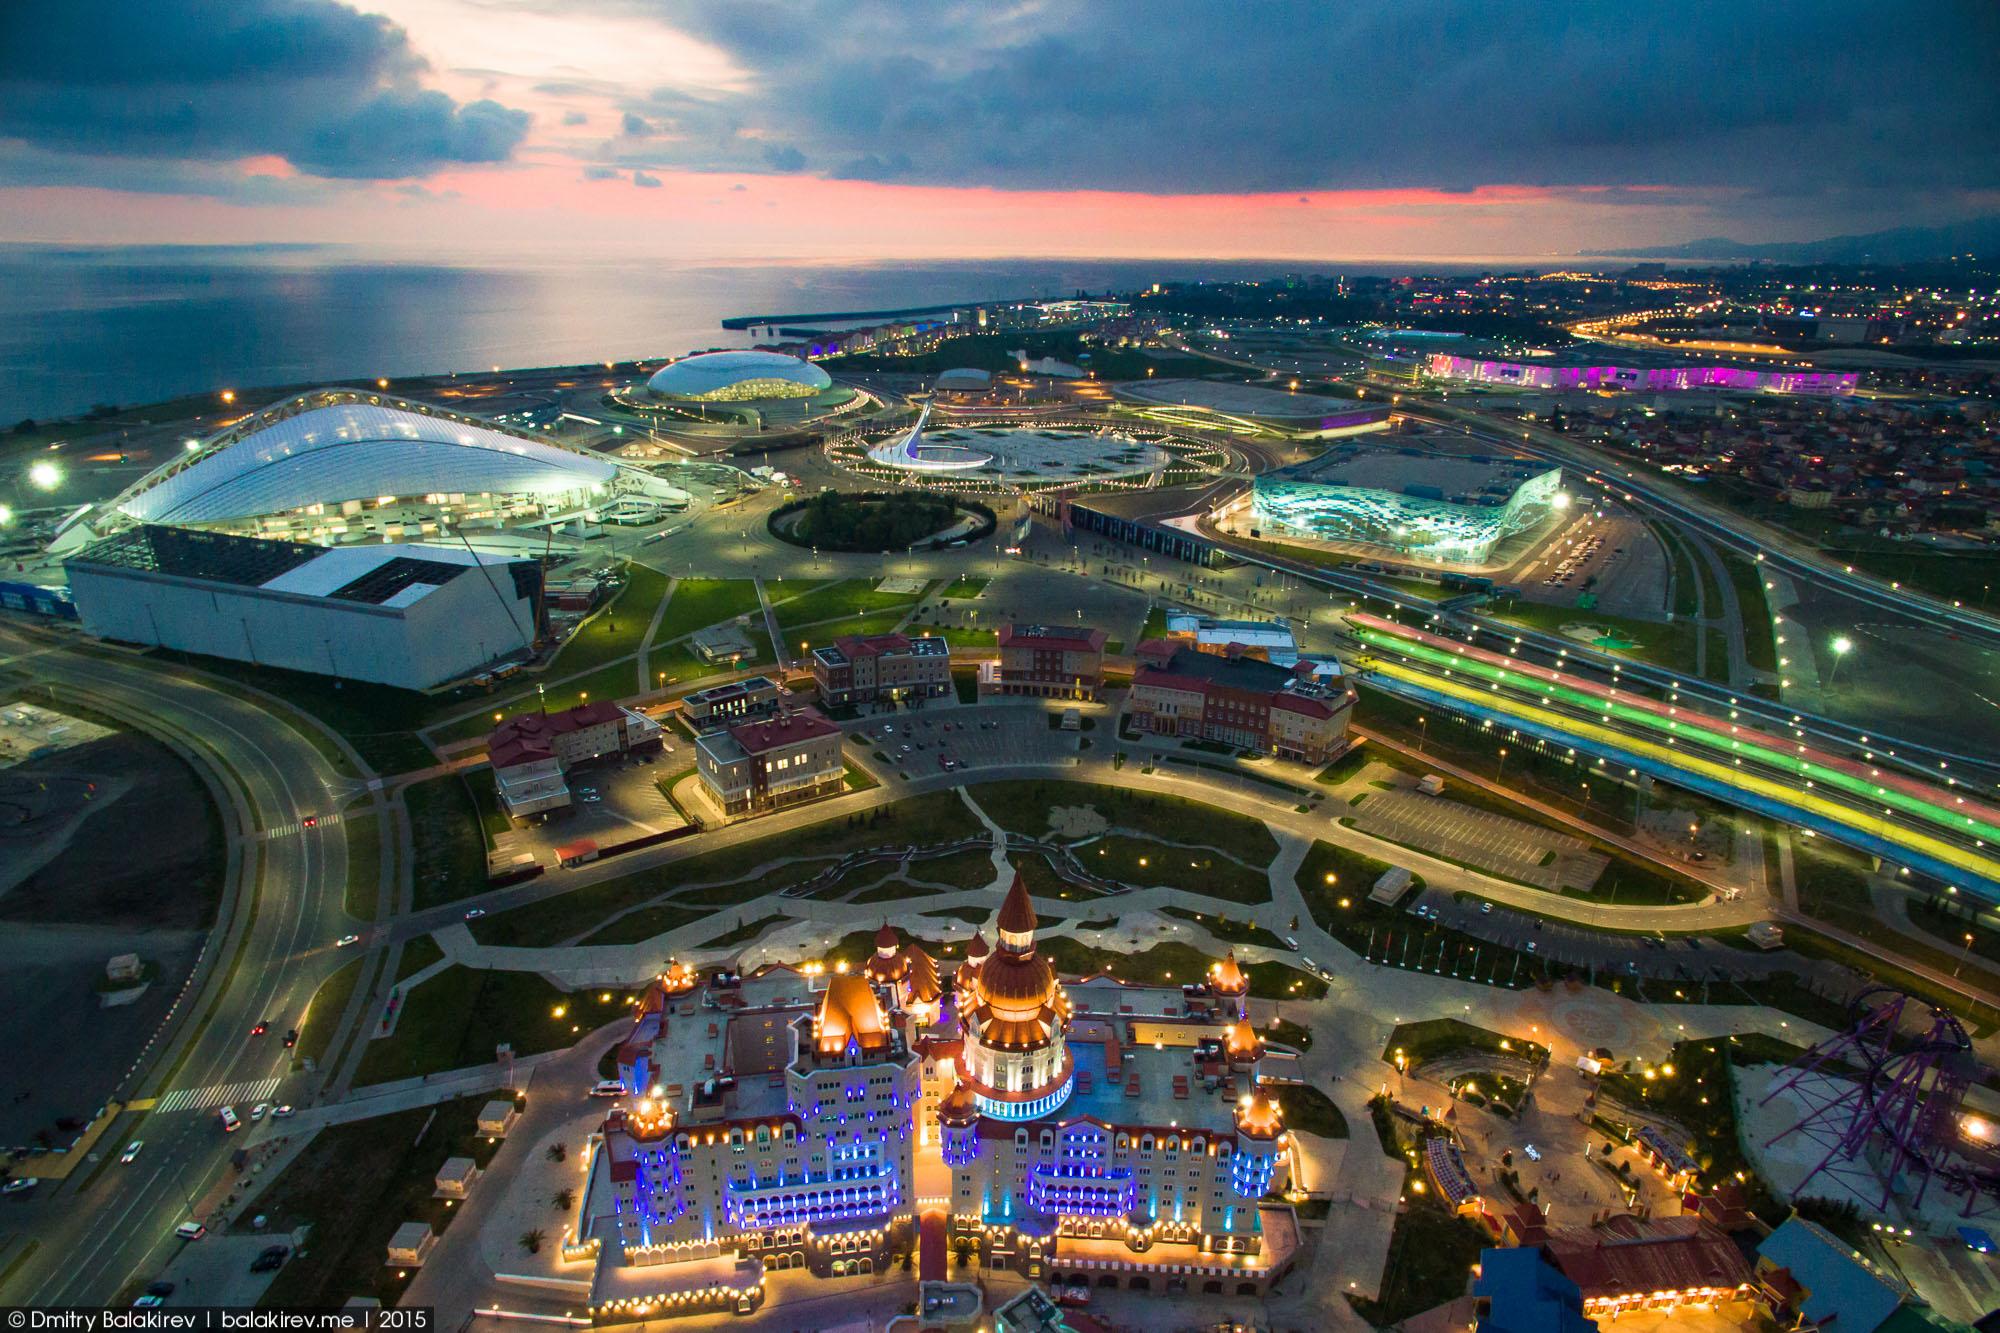 Олимпийский Сочи с высоты (с коптера) | Olimpic Sochi from drone